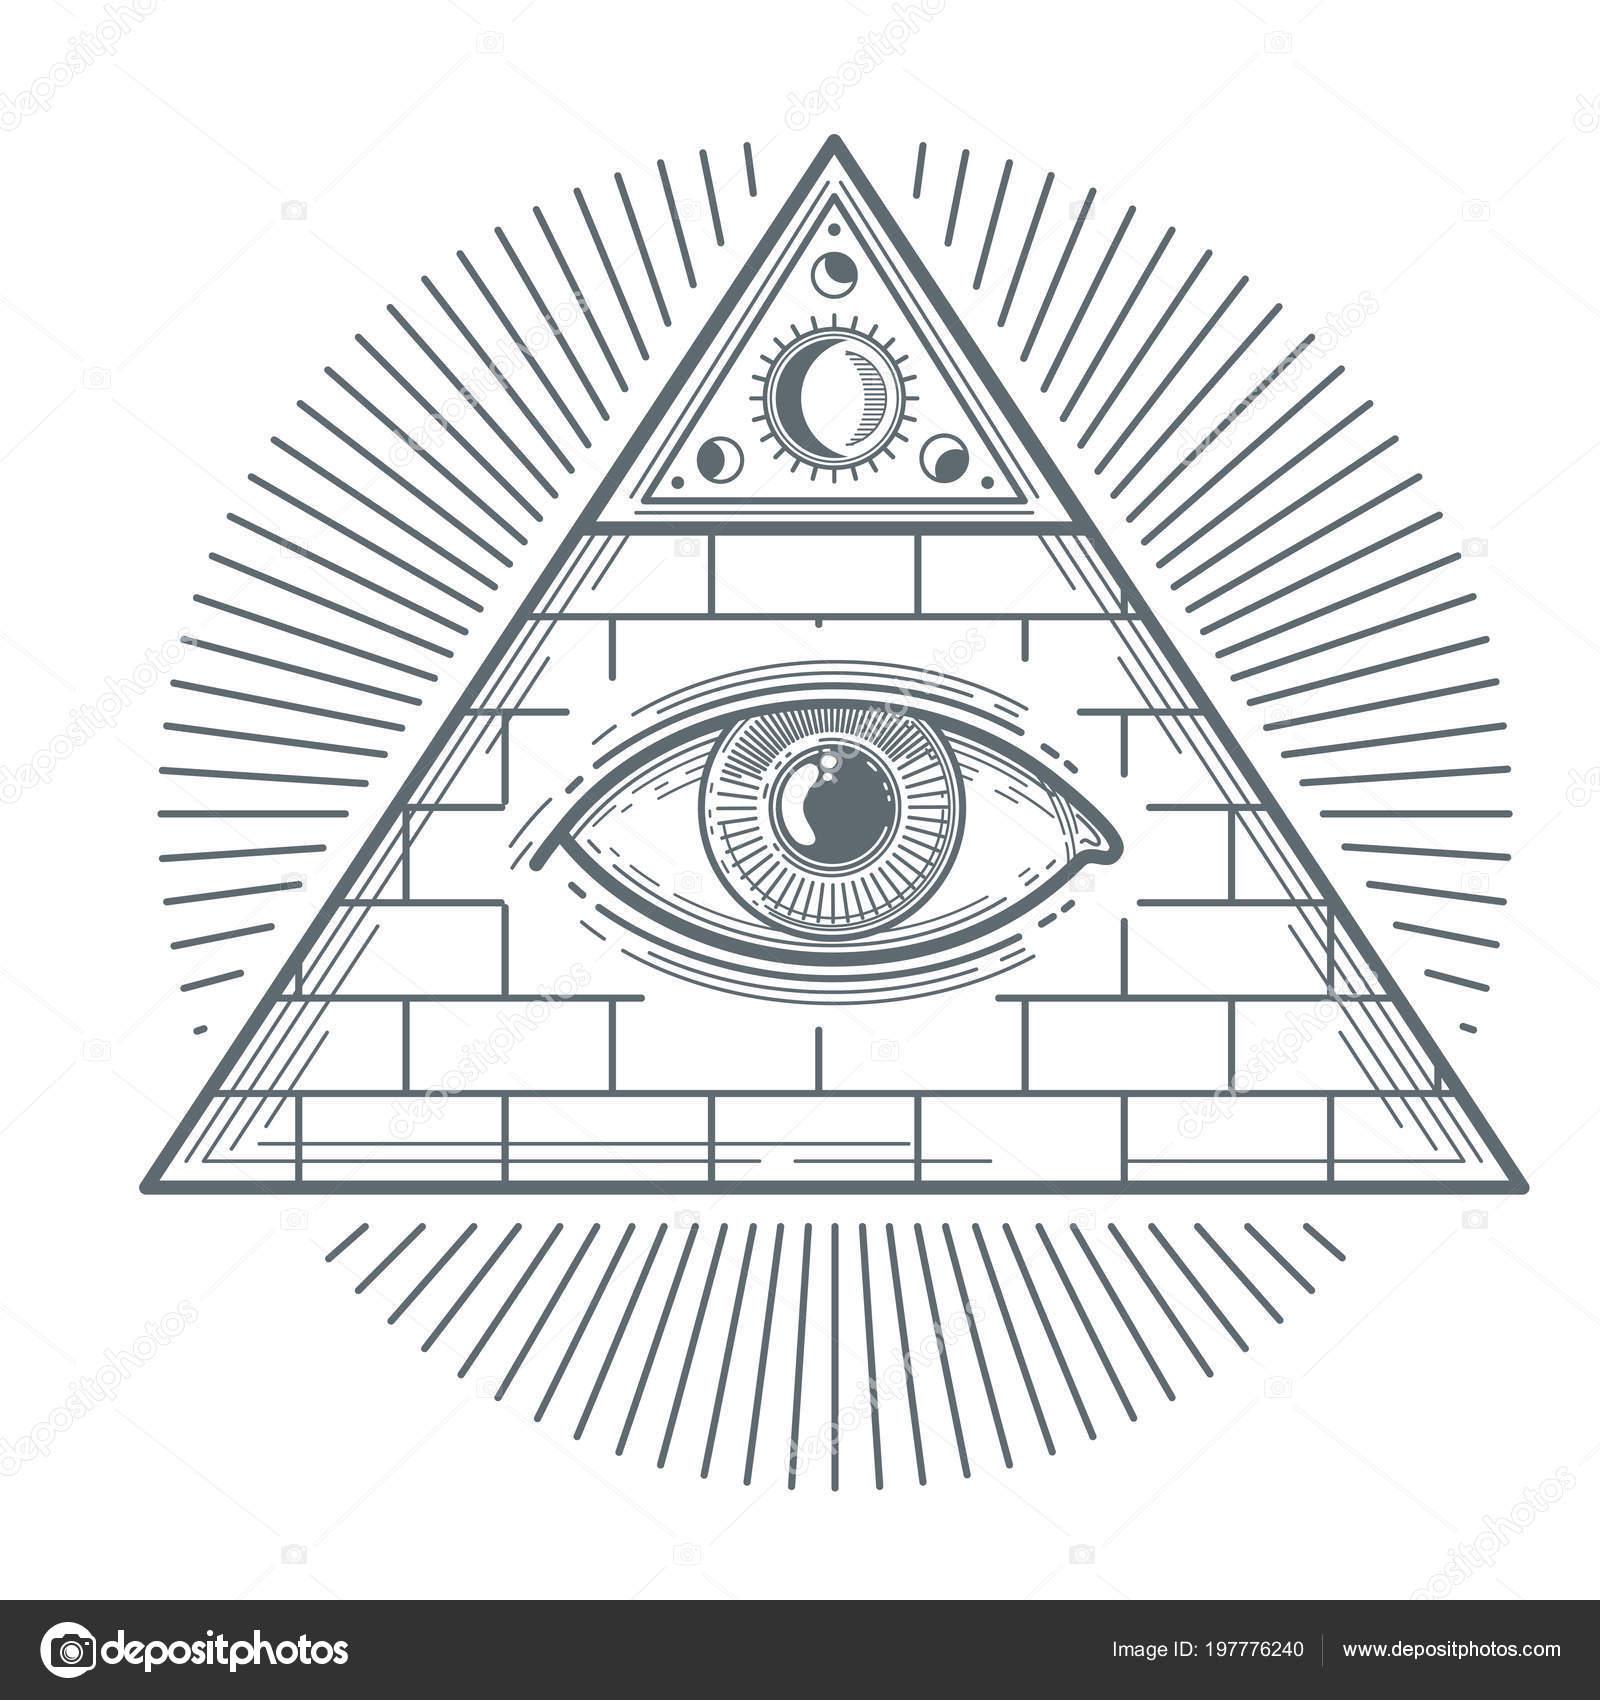 Mystical Occult Sign With Freemasonry Eye Symbol Vector Illustration